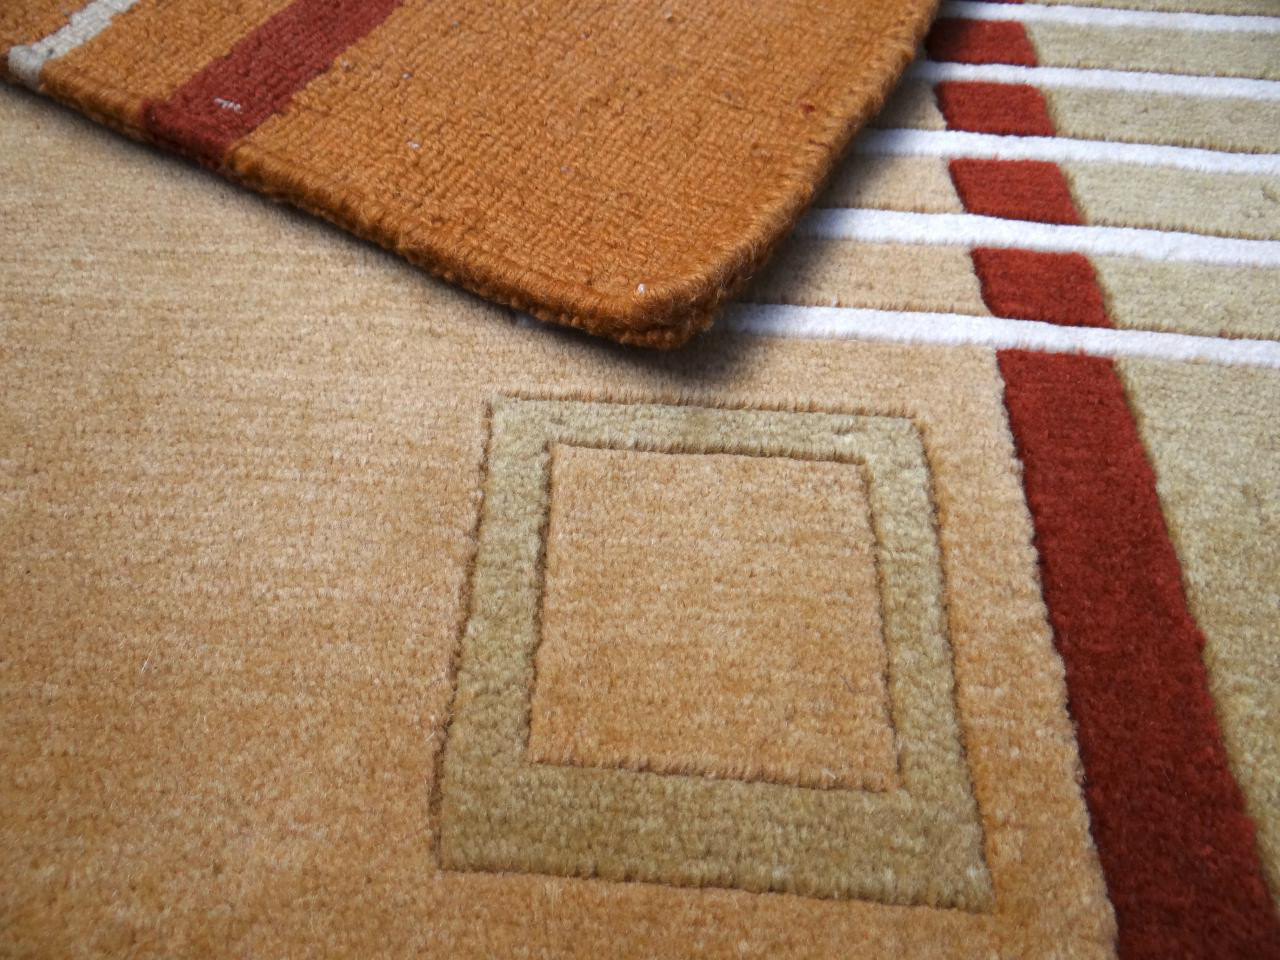 Terra 1 2251 tapis bordures n 33868 200x140cm - Tapis 200x140 ...